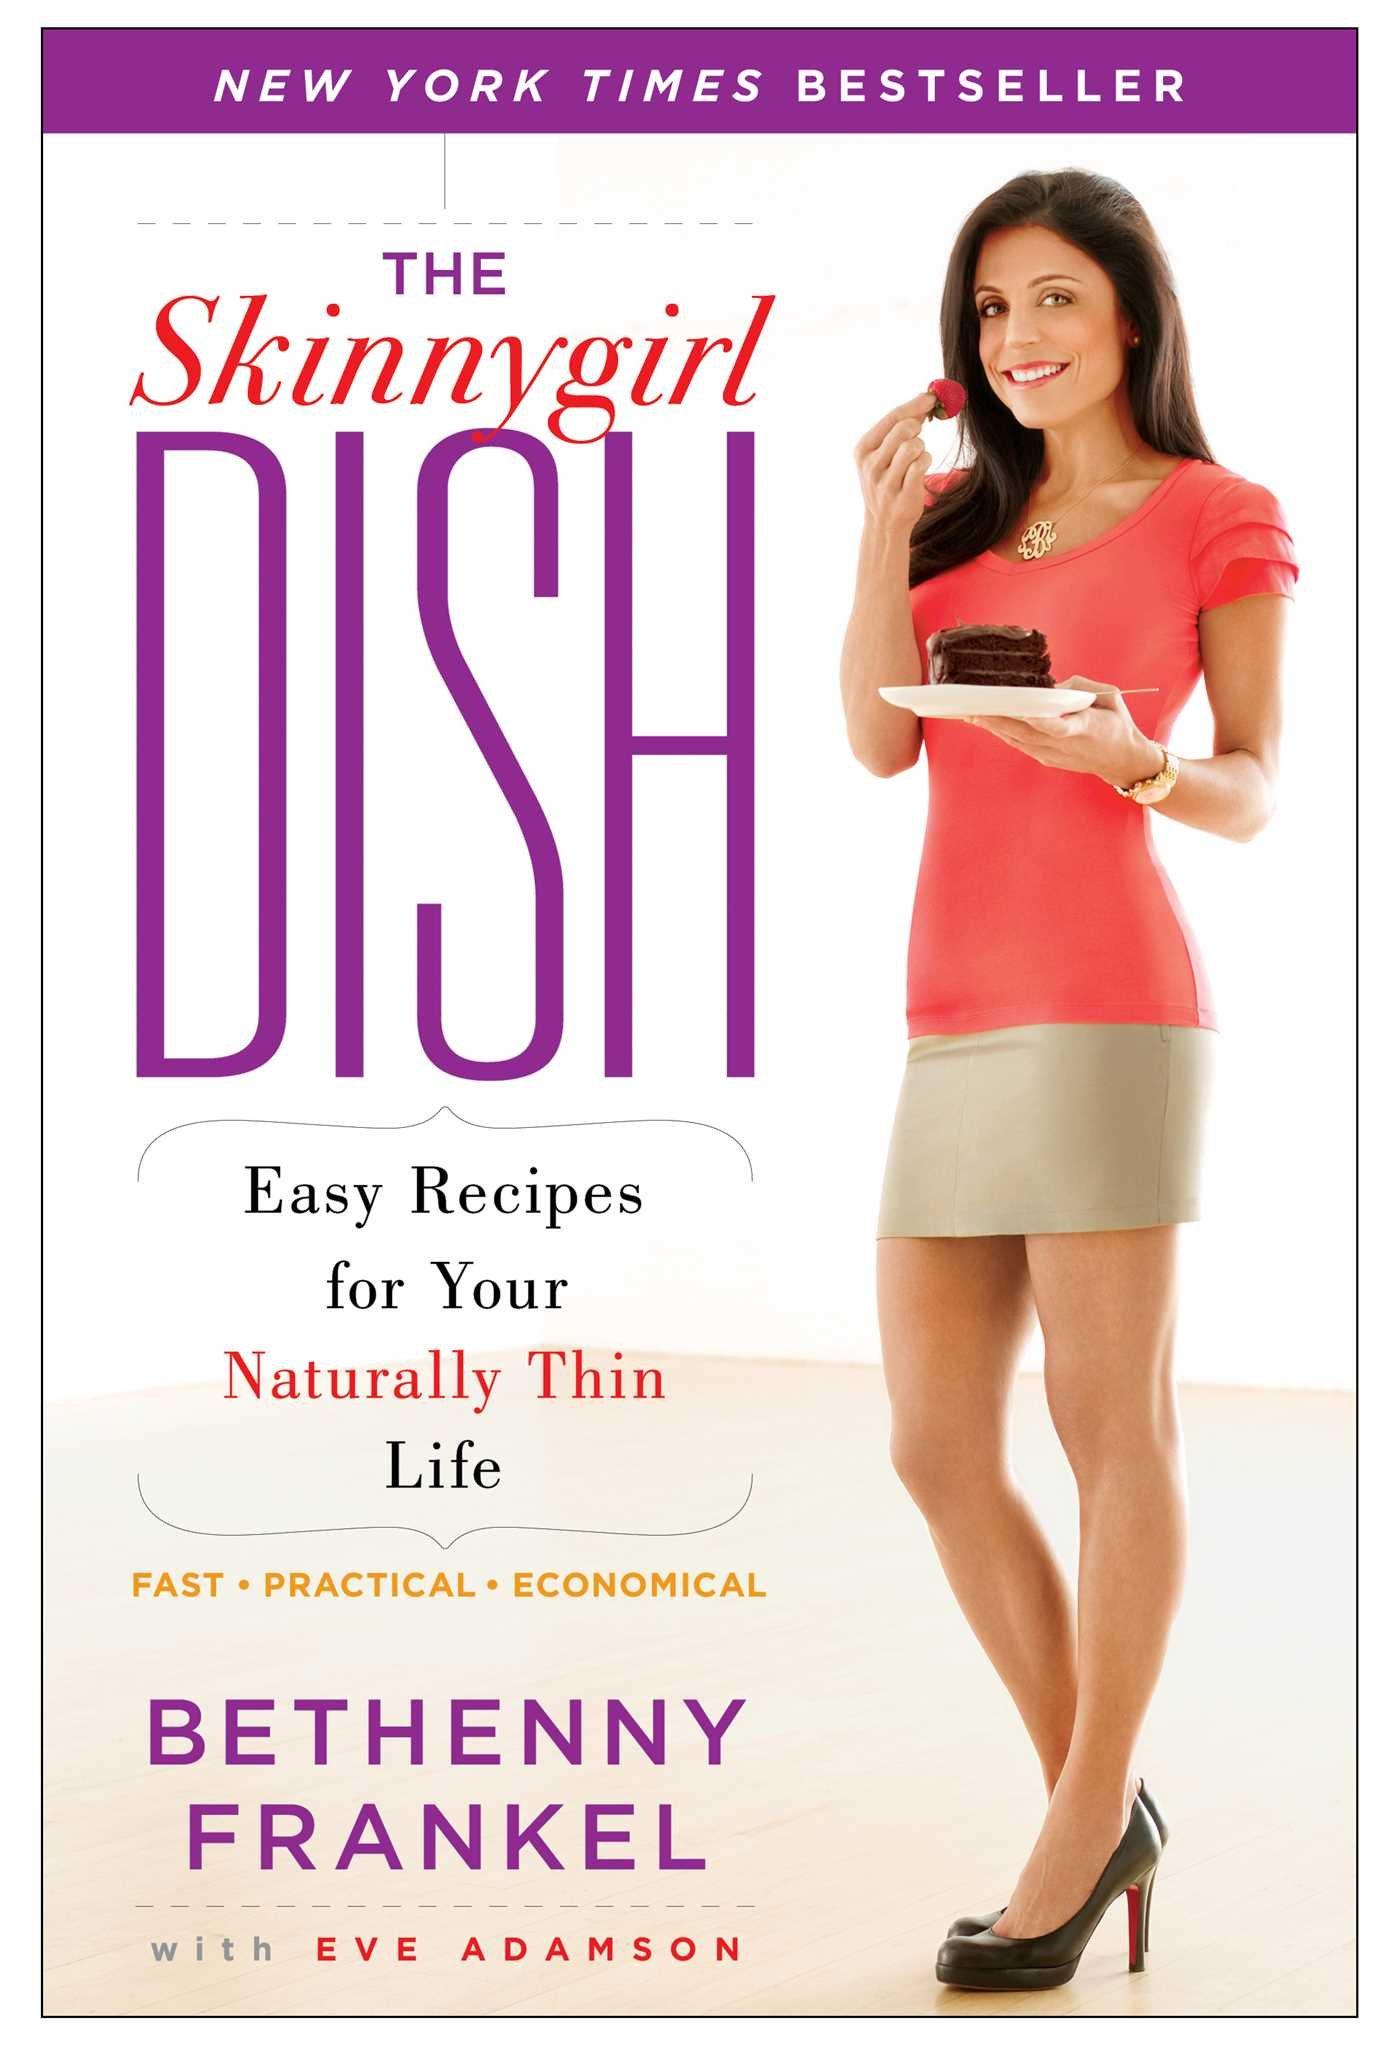 Bethenny book naturally thin